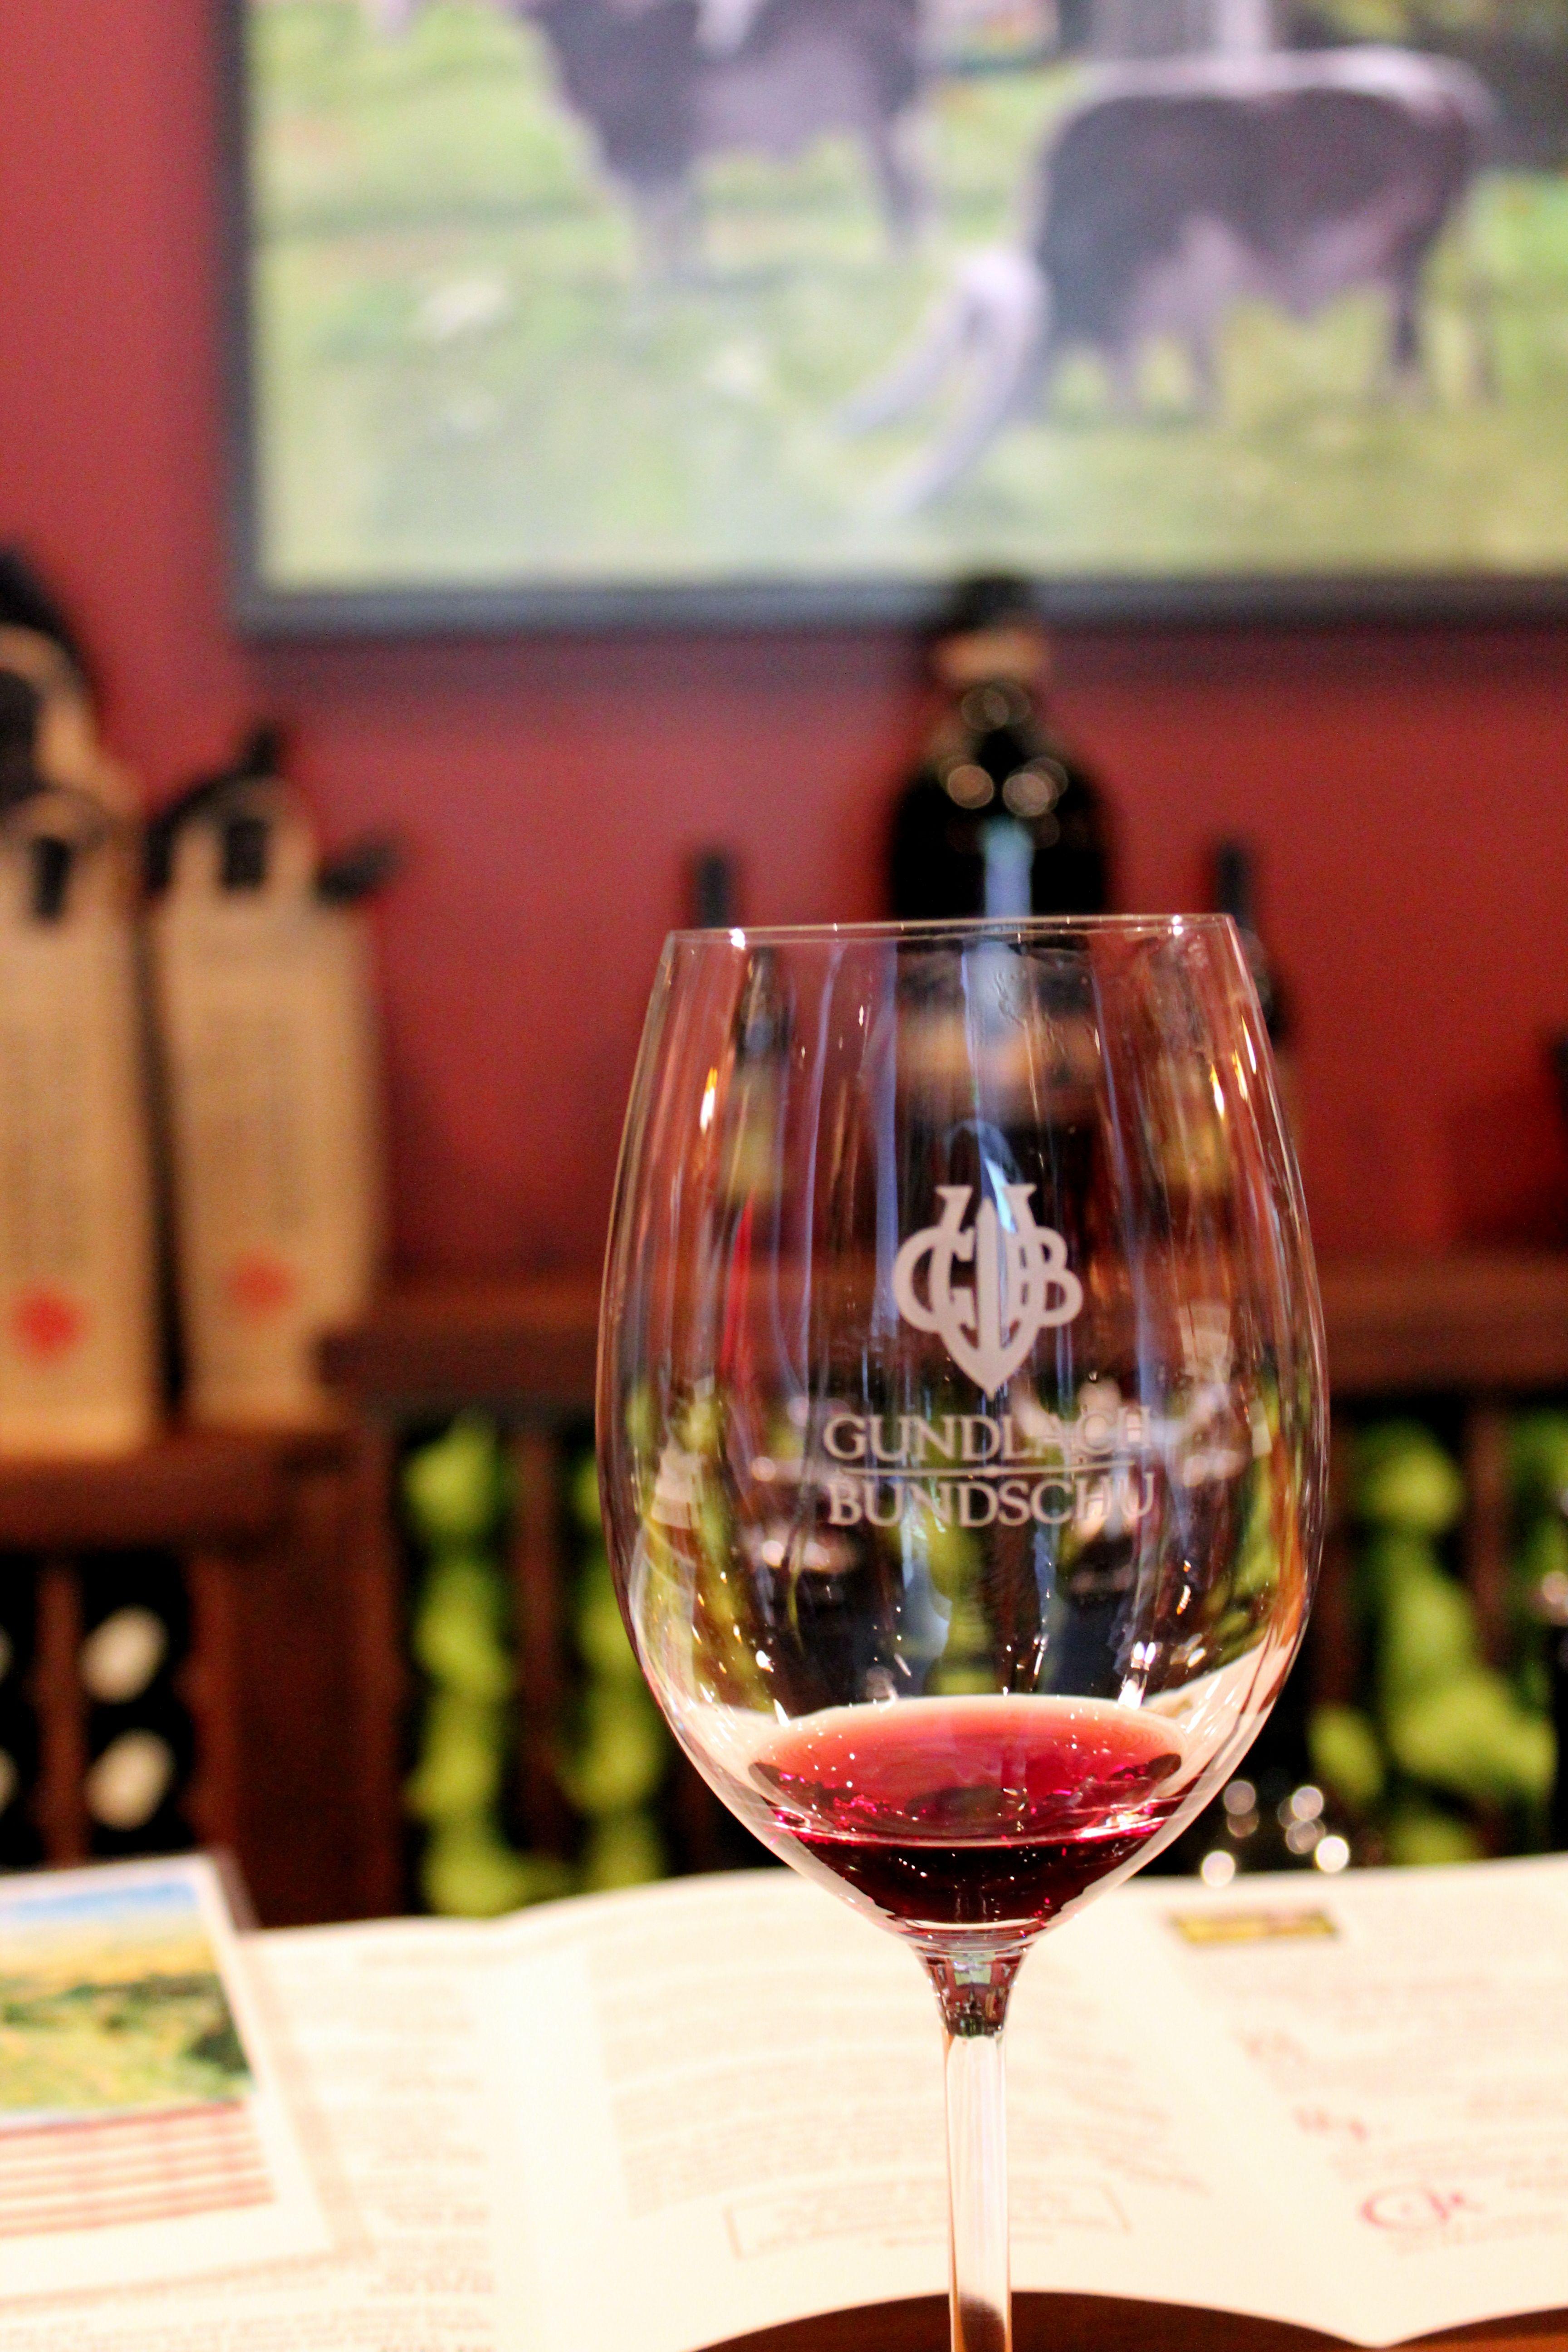 Gundlach Bundschu In Sonoma Ca Winery Glass Glassware